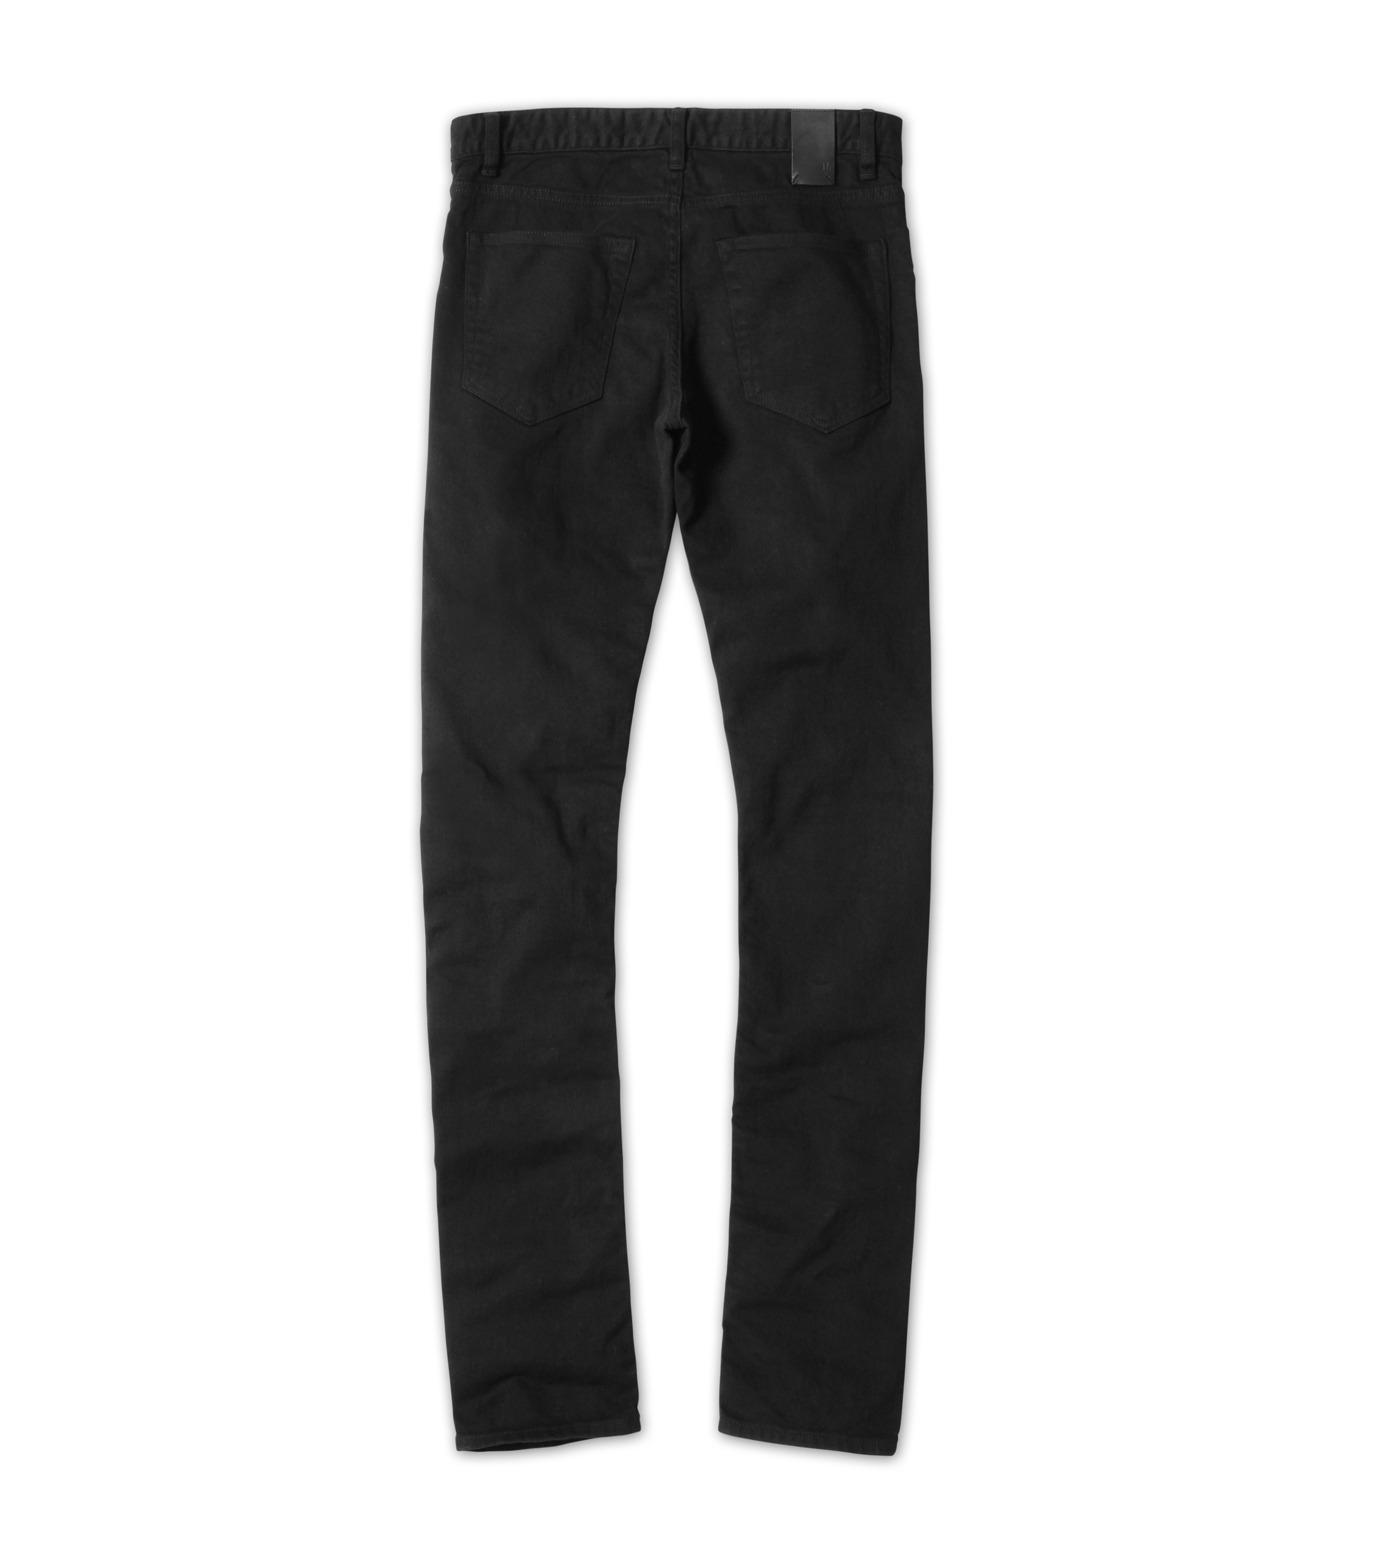 HL HEDDIE LOVU(エイチエル・エディールーヴ)のHL skinslim-BLACK(パンツ/pants)-HL-skinslim-13 拡大詳細画像7